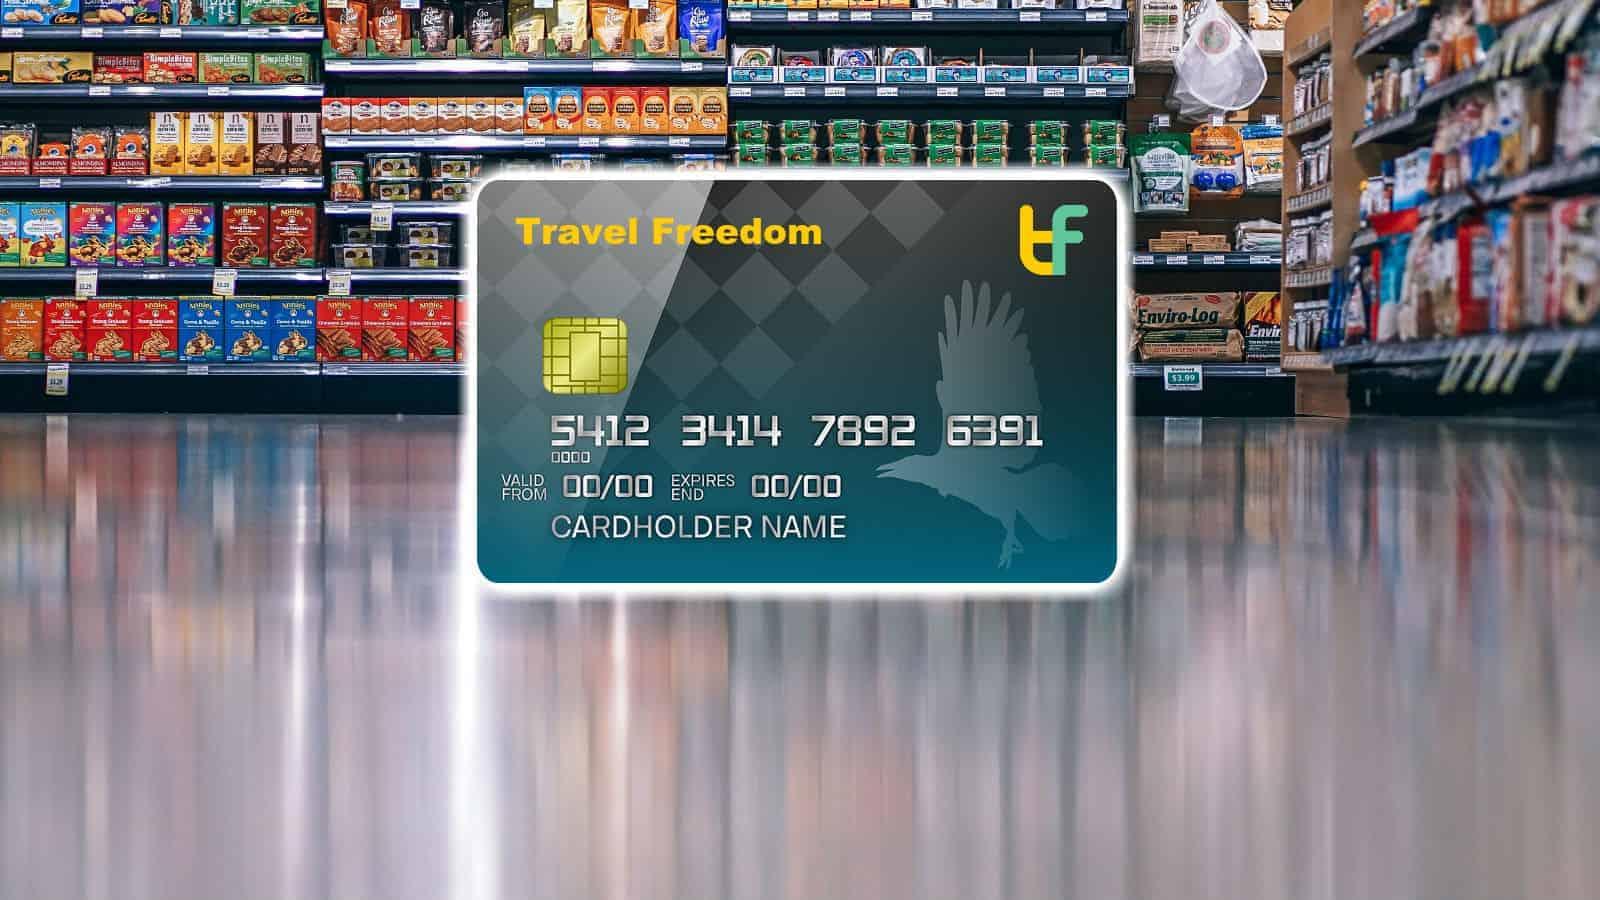 Big Lots Credit Card Review Bonus 3 Better Alternative Credit Cards